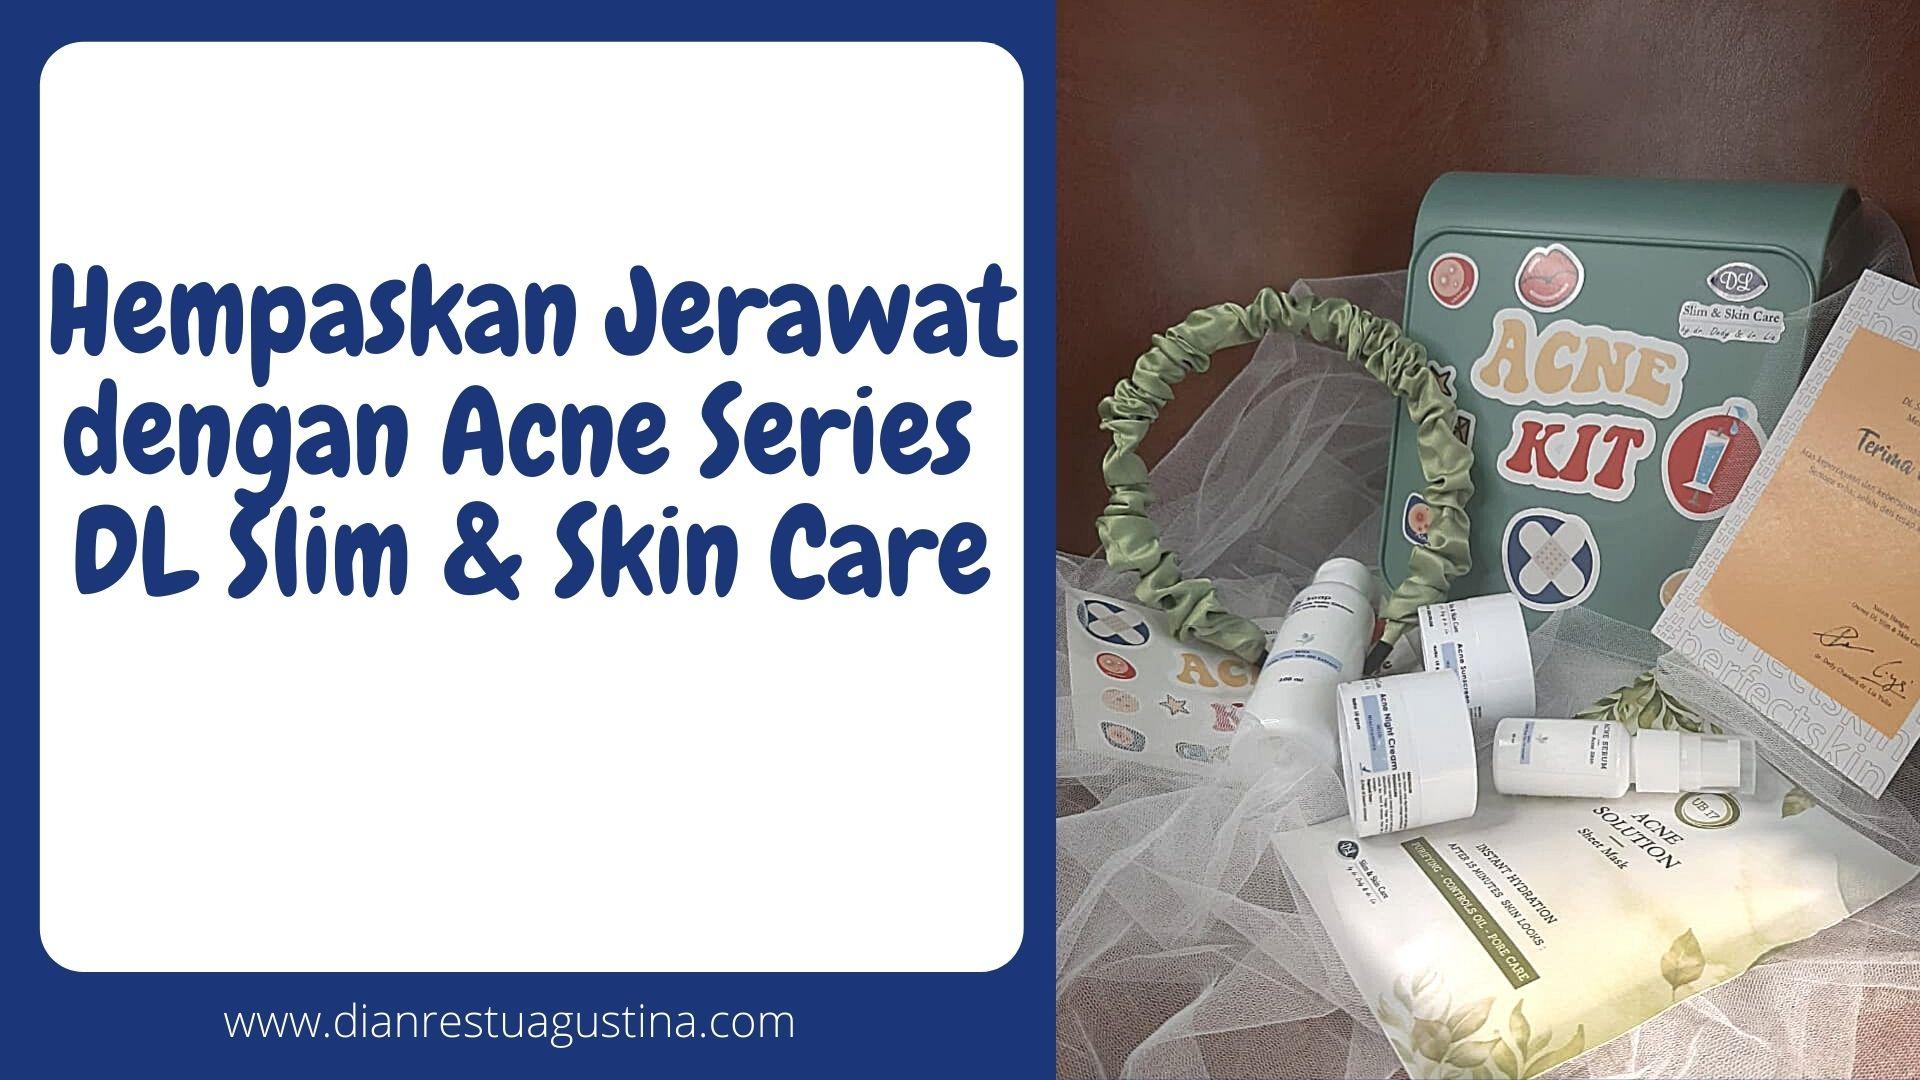 Review Acne Series DL Slim & Skin Care